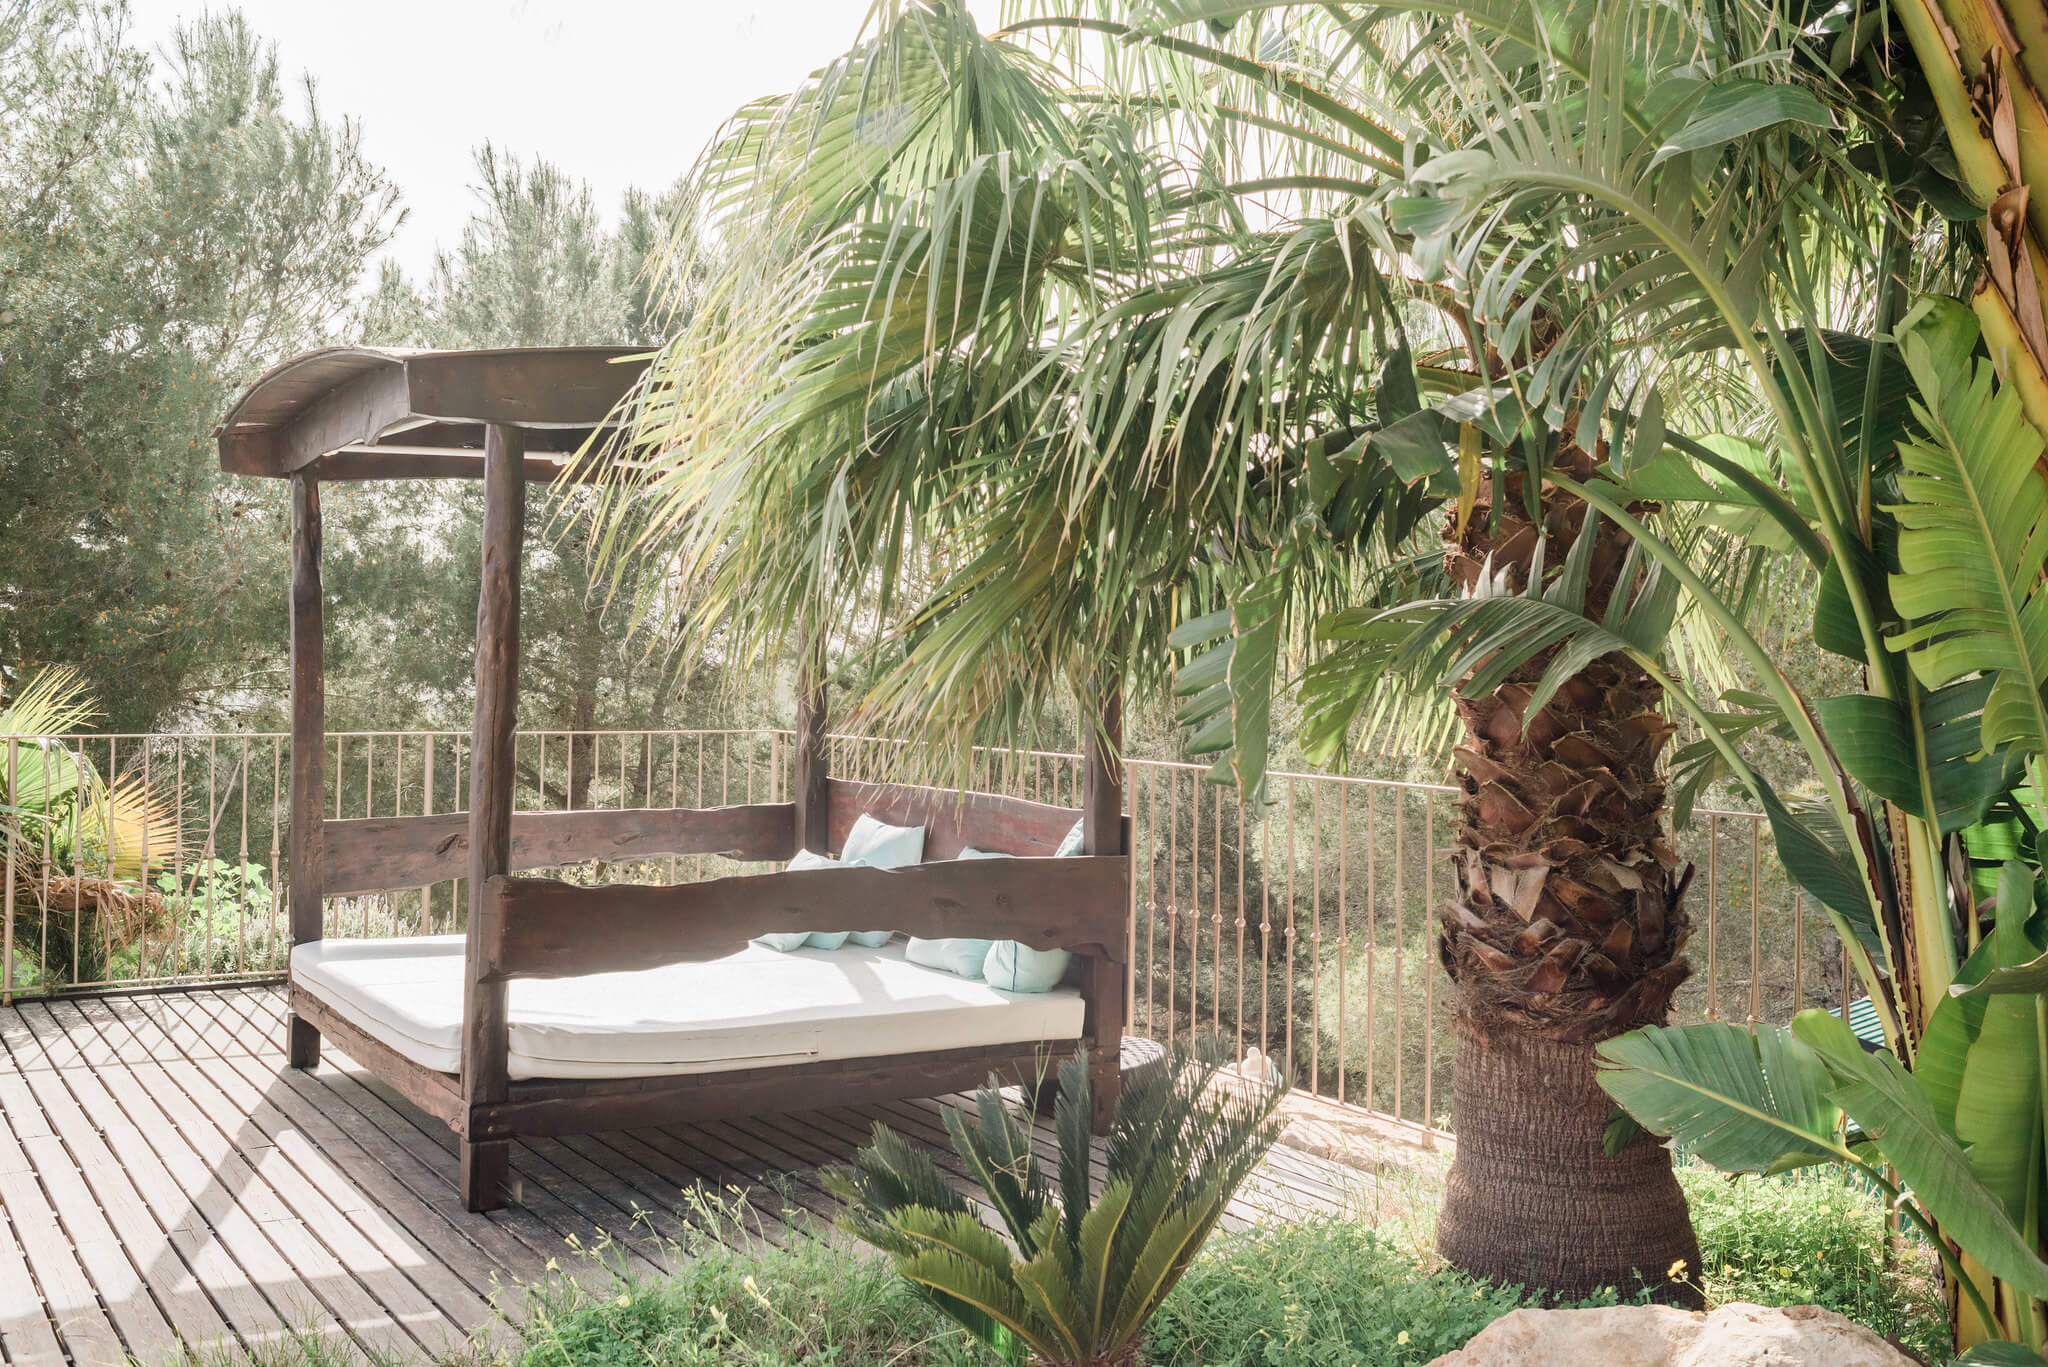 https://www.white-ibiza.com/wp-content/uploads/2020/06/white-ibiza-villas-los-corrales-exterior-day-bed.jpg